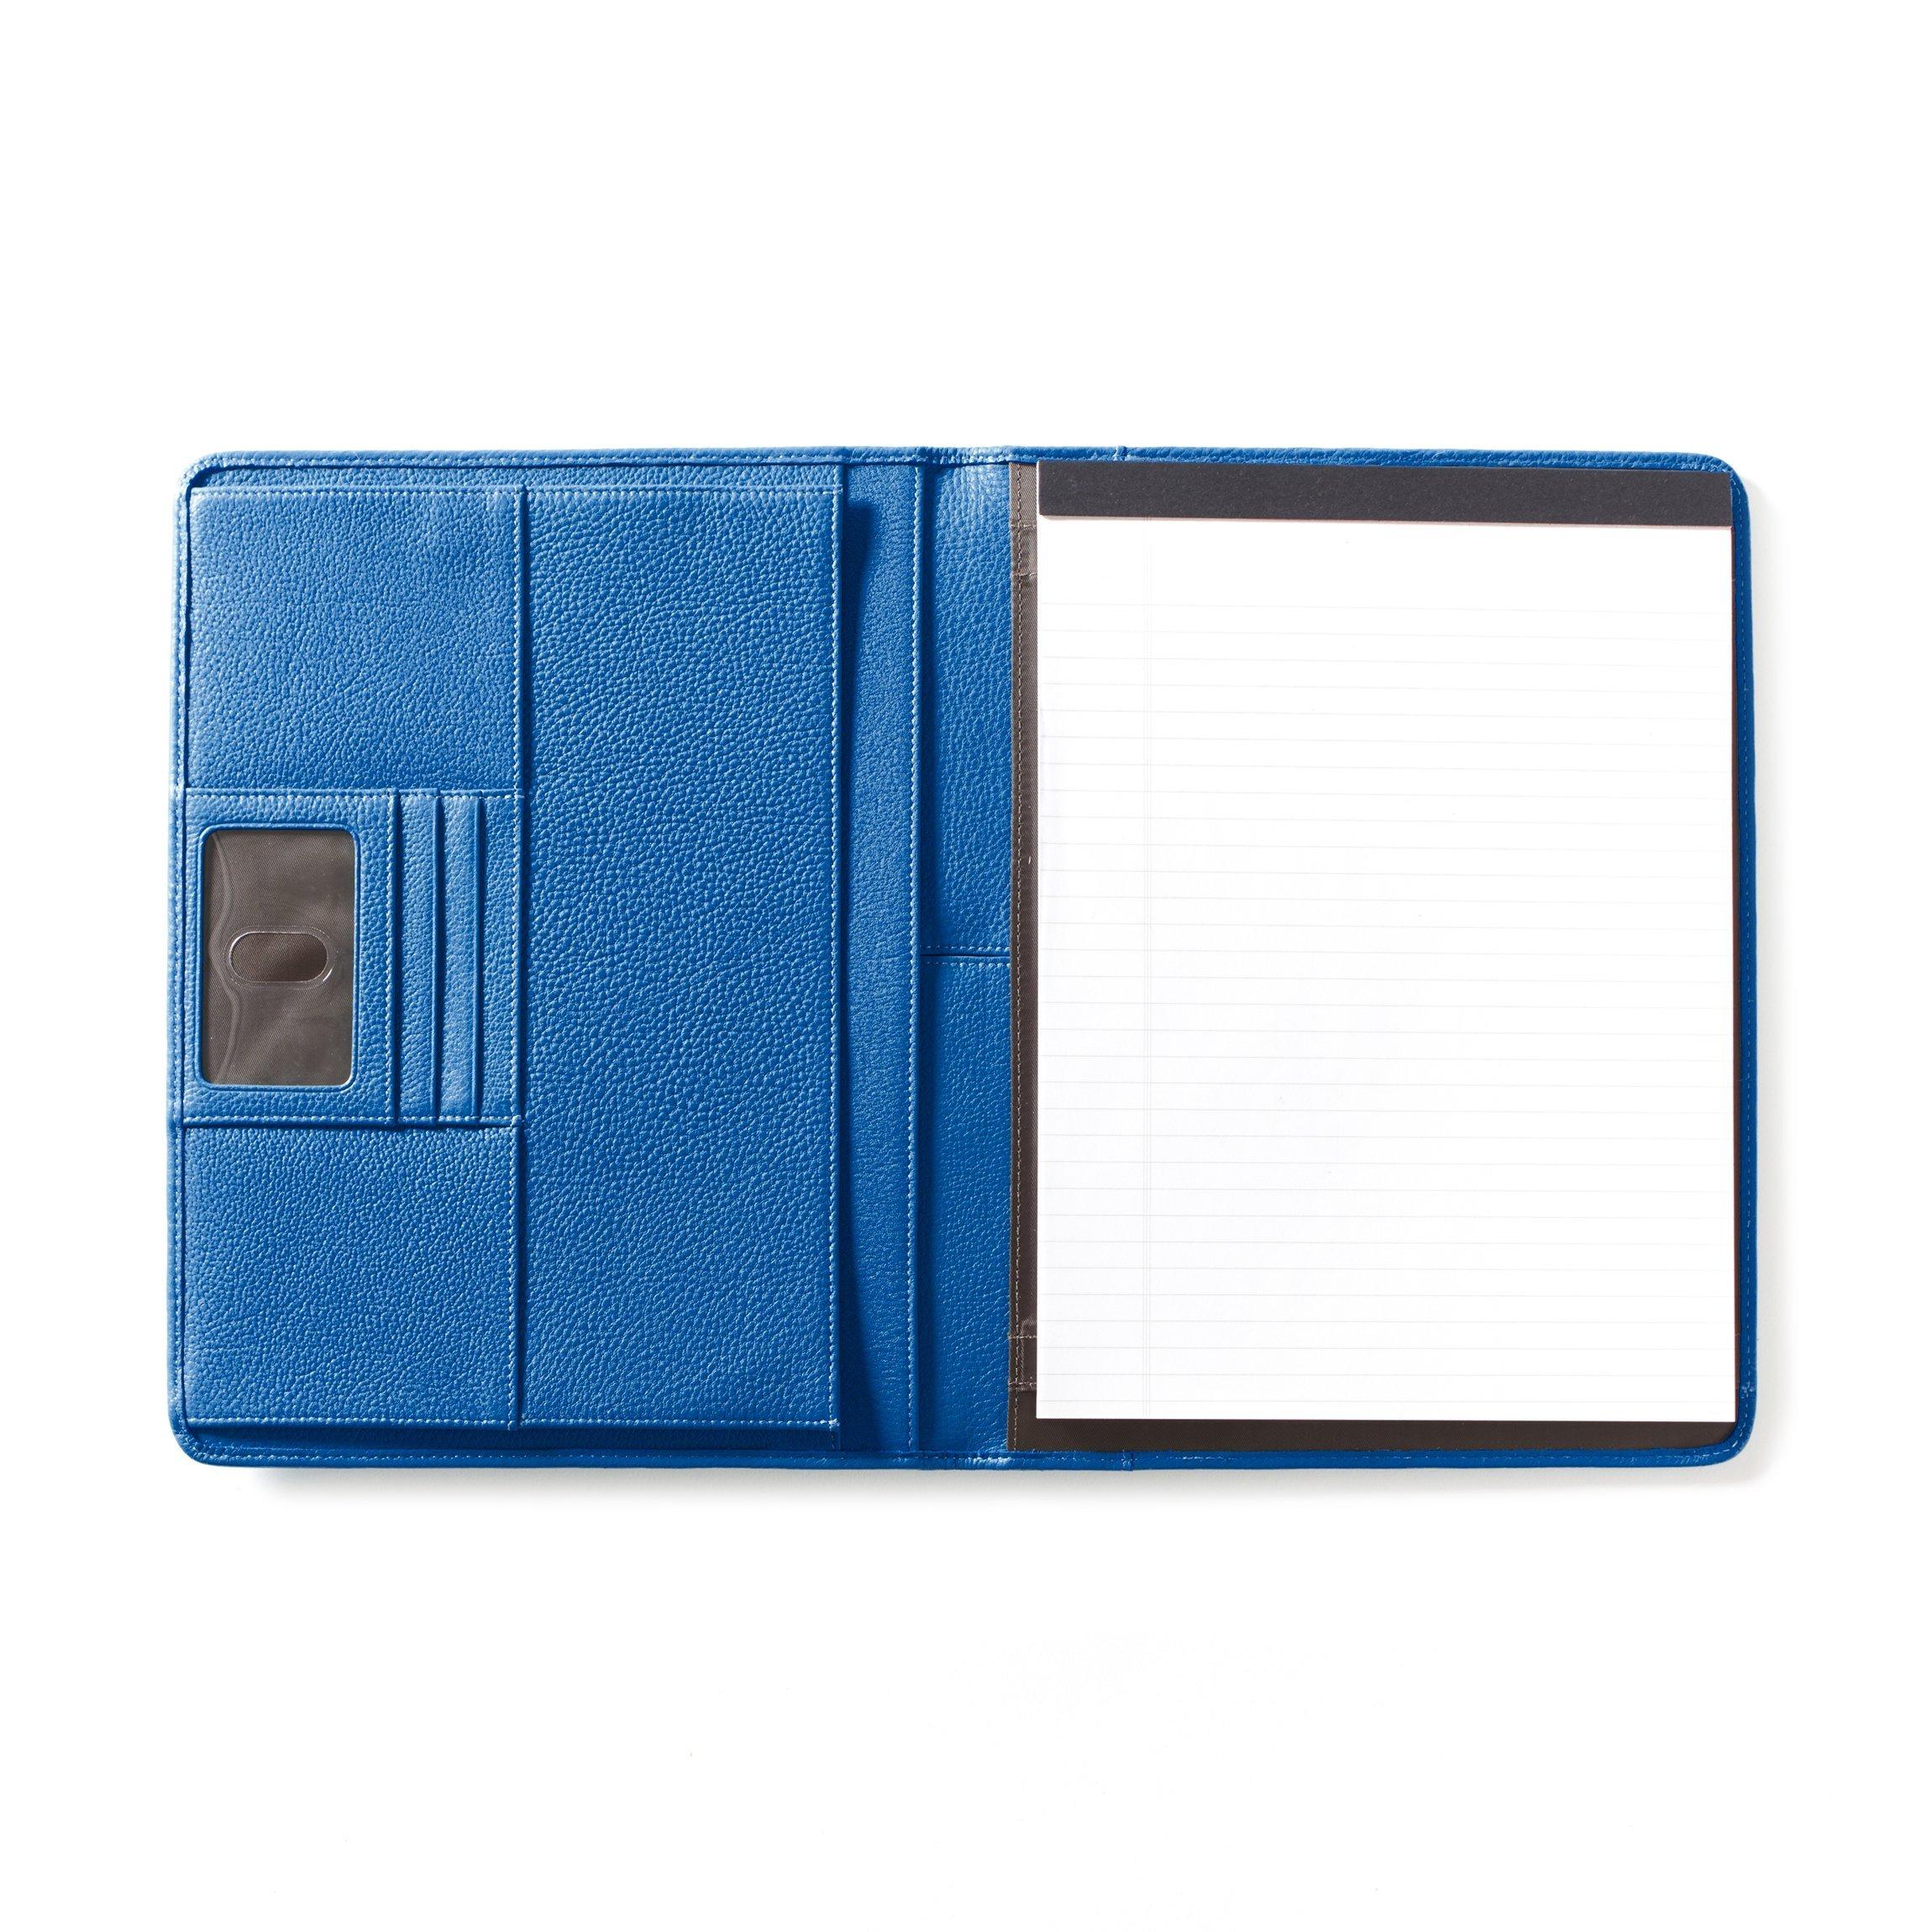 Leatherology Deluxe Portfolio - Full Grain Leather - Cobalt (blue)